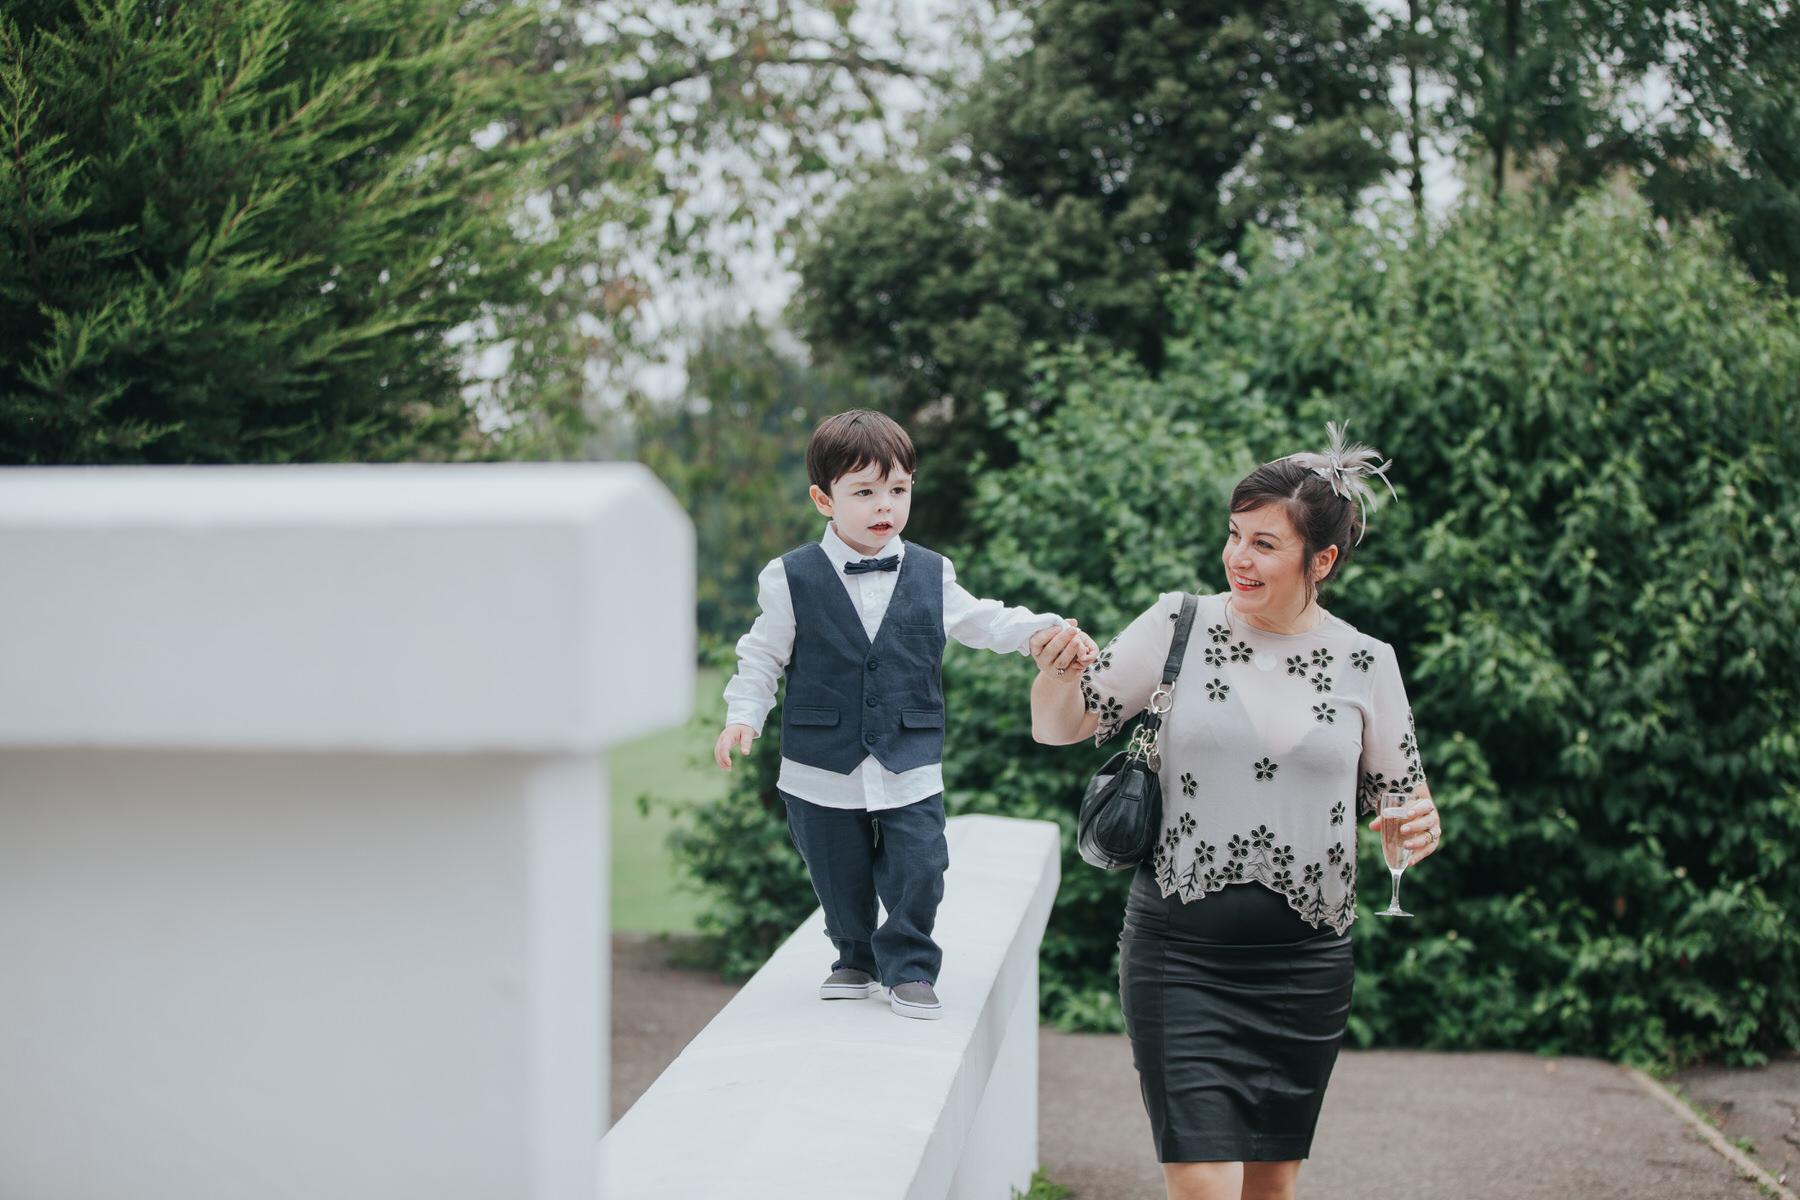 212 documentary style wedding guest reportage.jpg